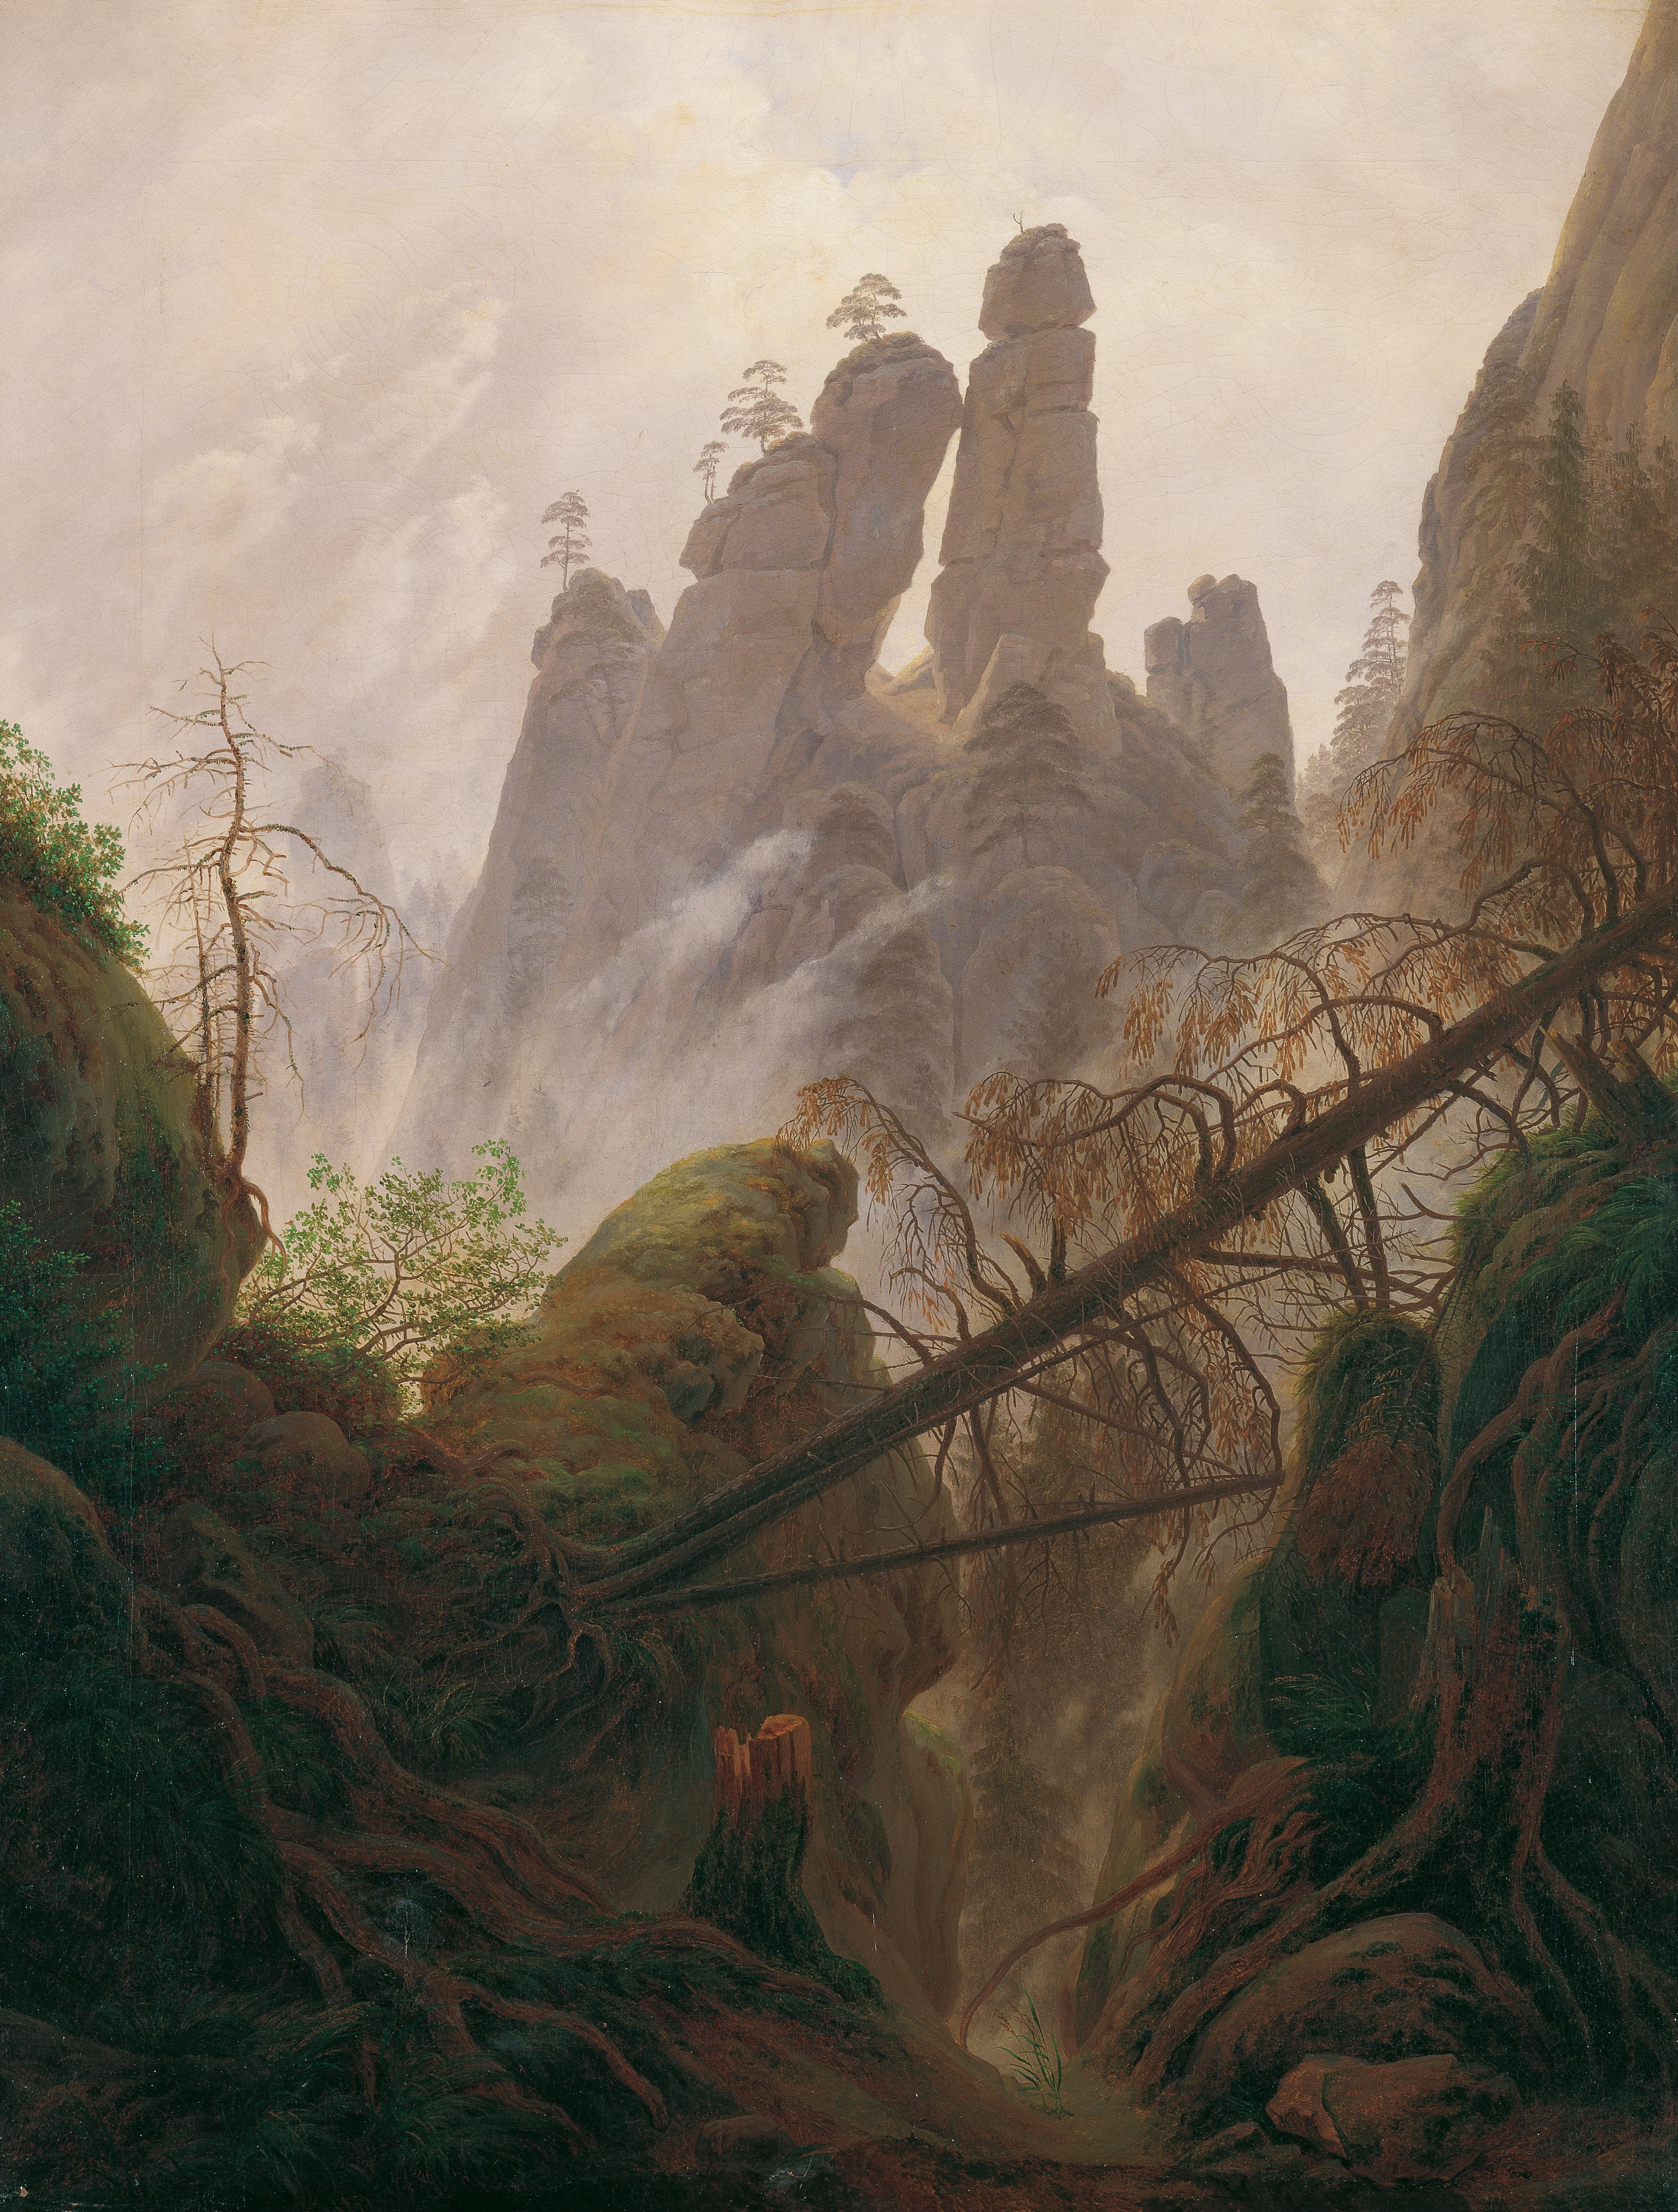 Rocky_Landscape_in_the_Elbe_Sandstone_Mountains_-_Caspar_David_Friedrich_-_Google_Cultural_Institute